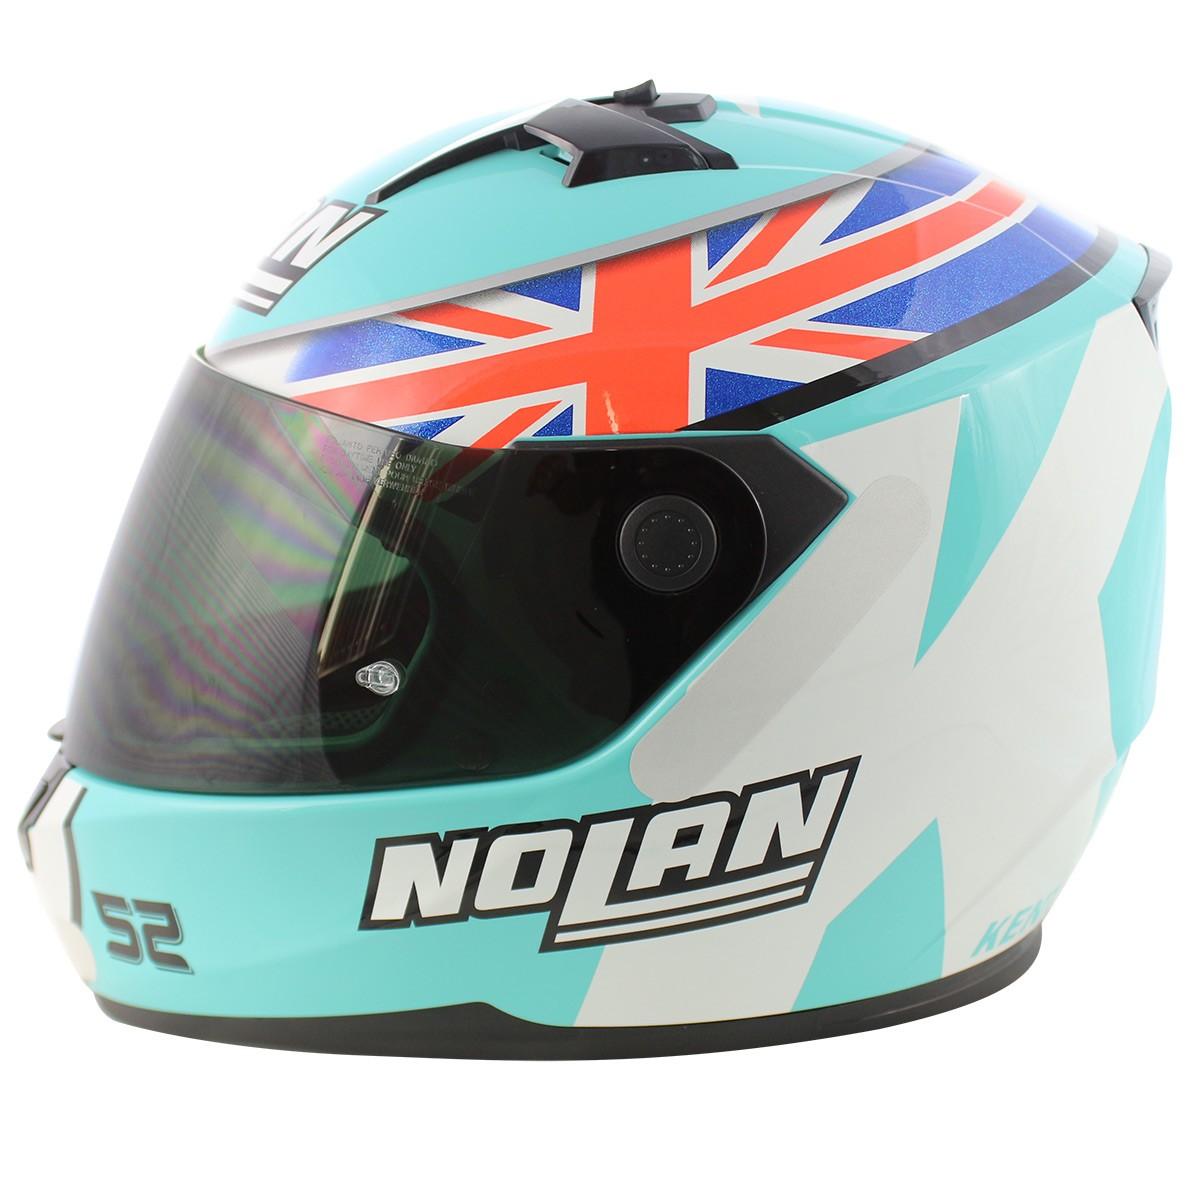 Capacete Nolan N64 Gemini Réplica D.Kent Aquamarine NOVO! - Ganhe Balaclava Exclusiva!  - Nova Suzuki Motos e Acessórios